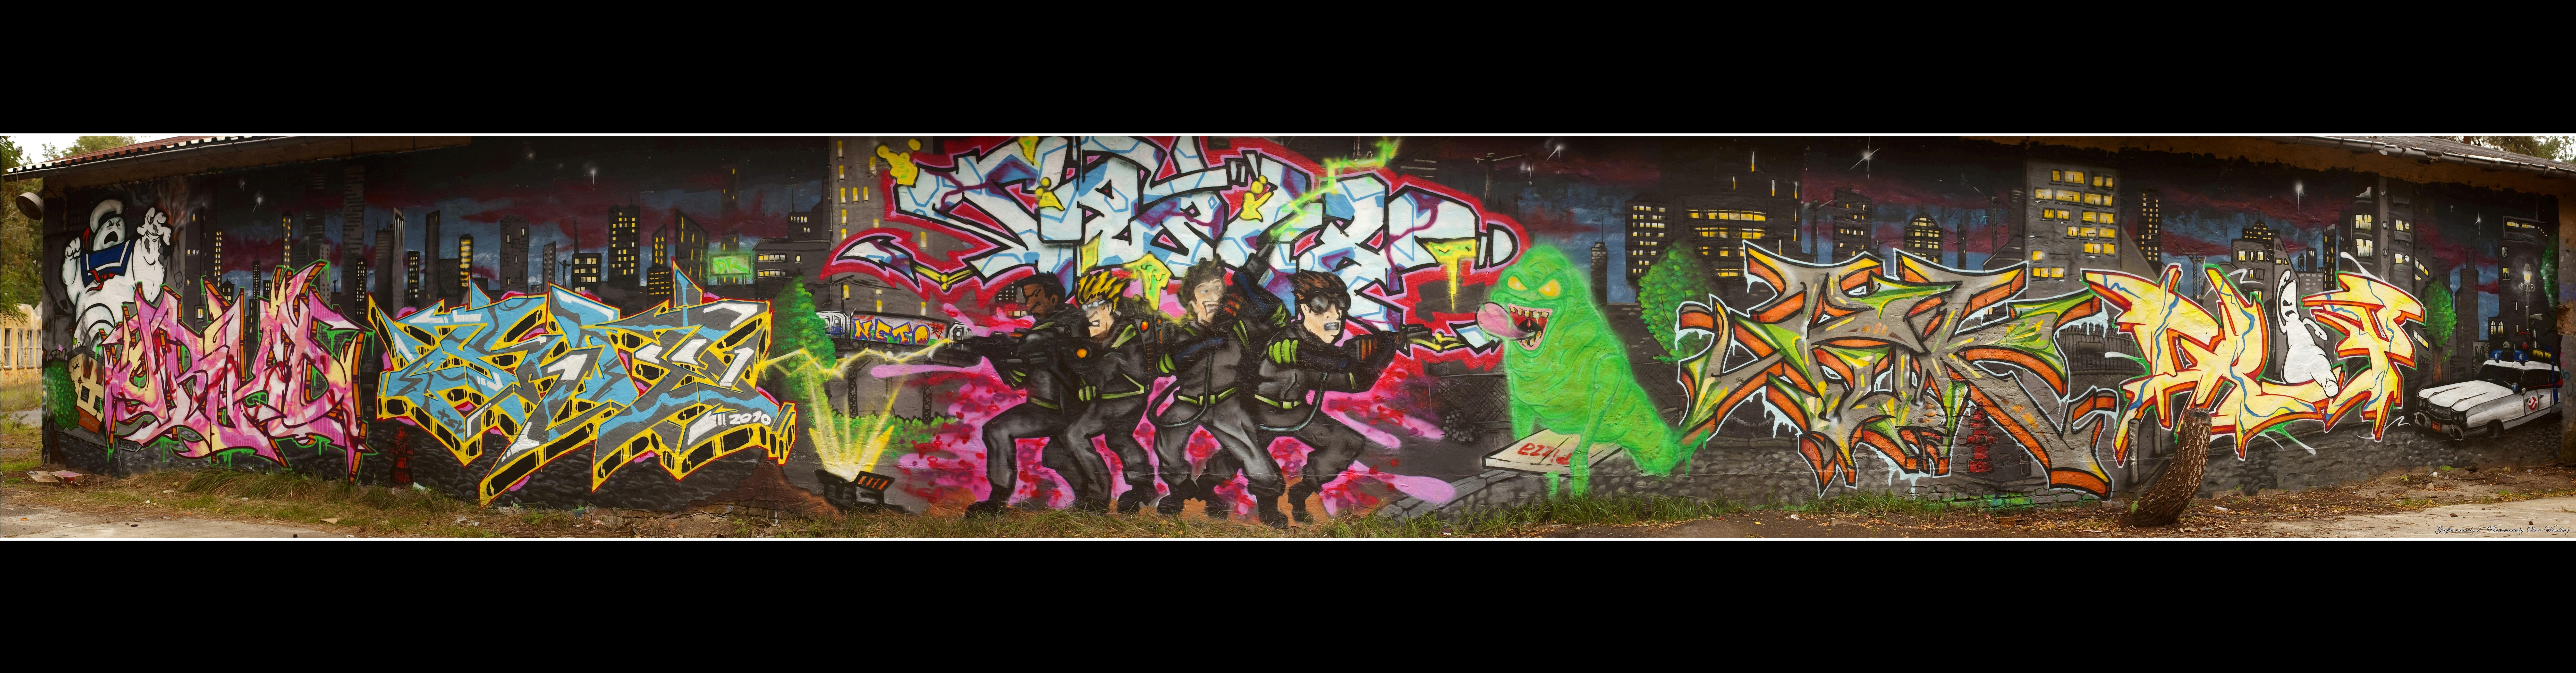 Ghostbuster Graffiti by Ollidoro